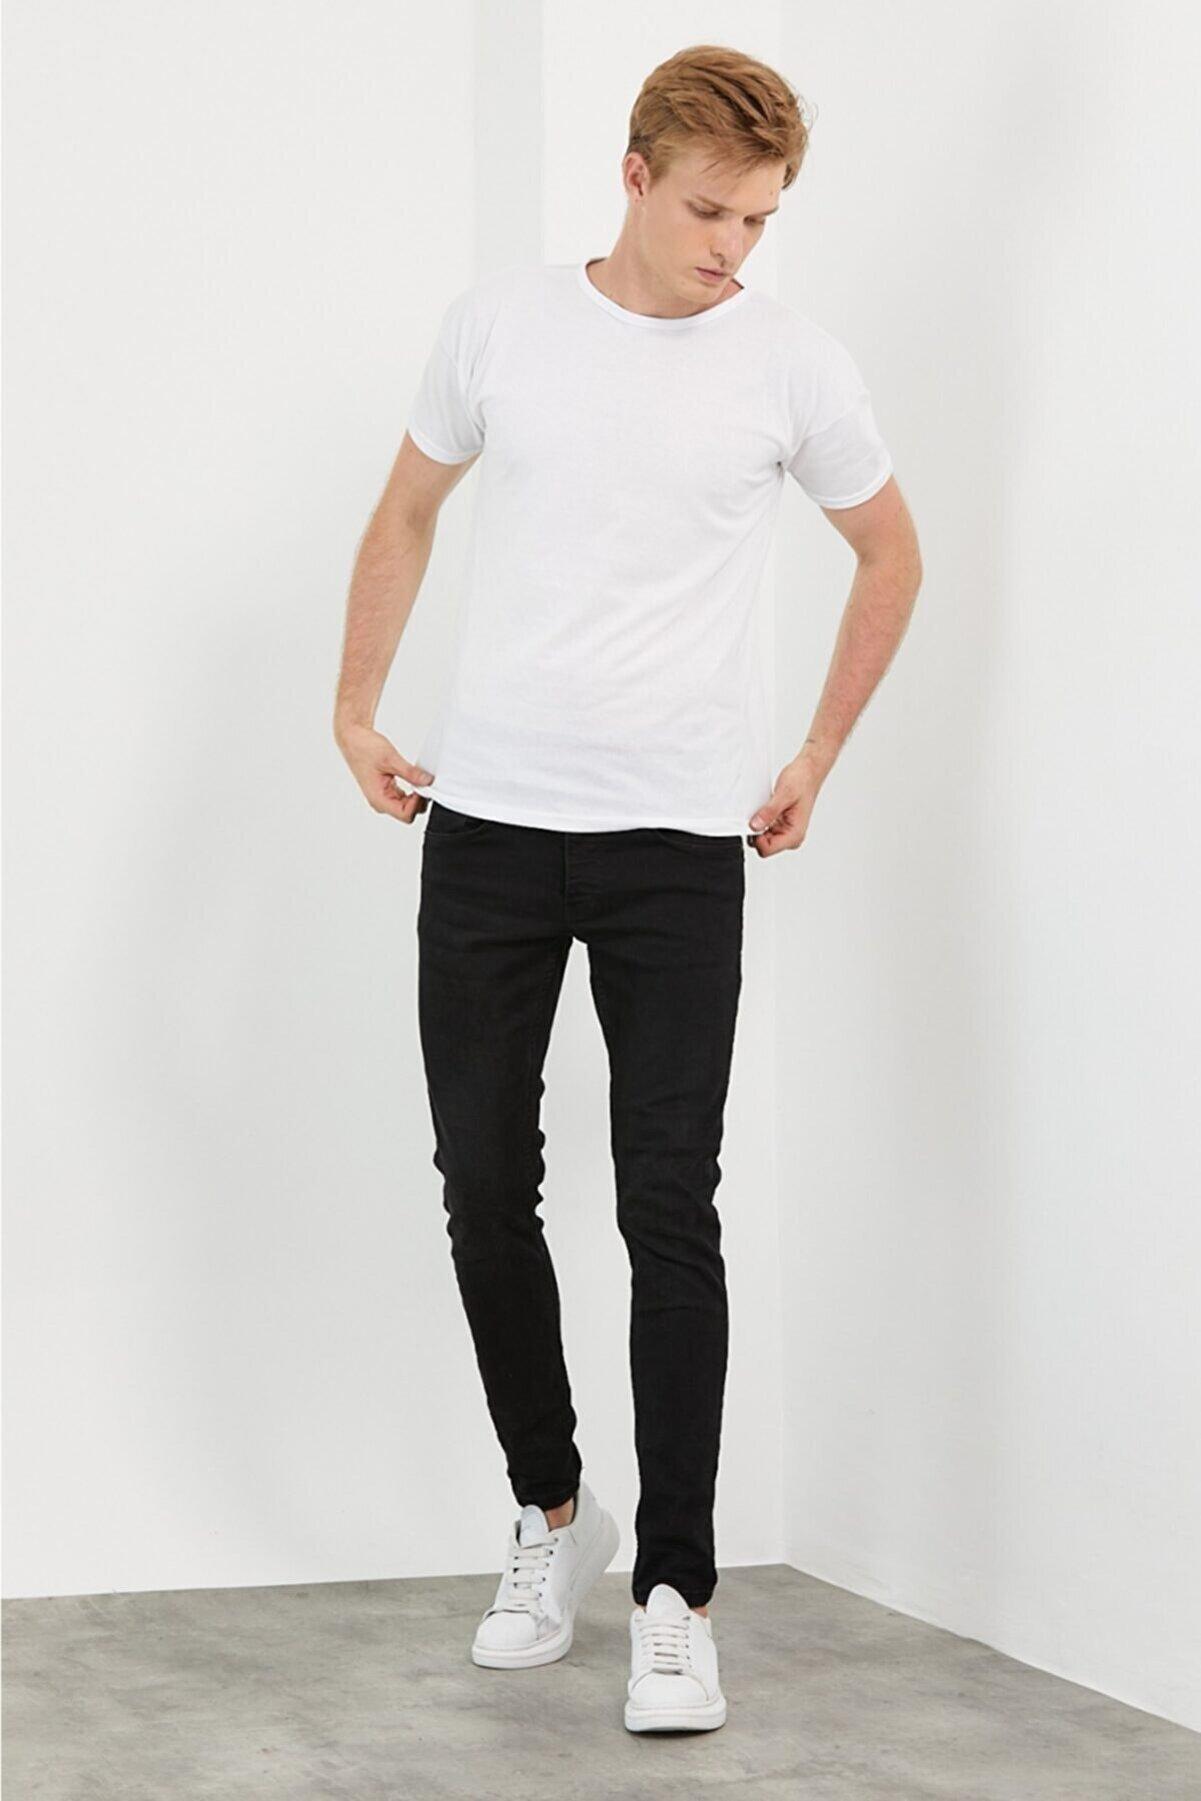 LEVEL HİGH Regular Sade Beyaz T-shirt